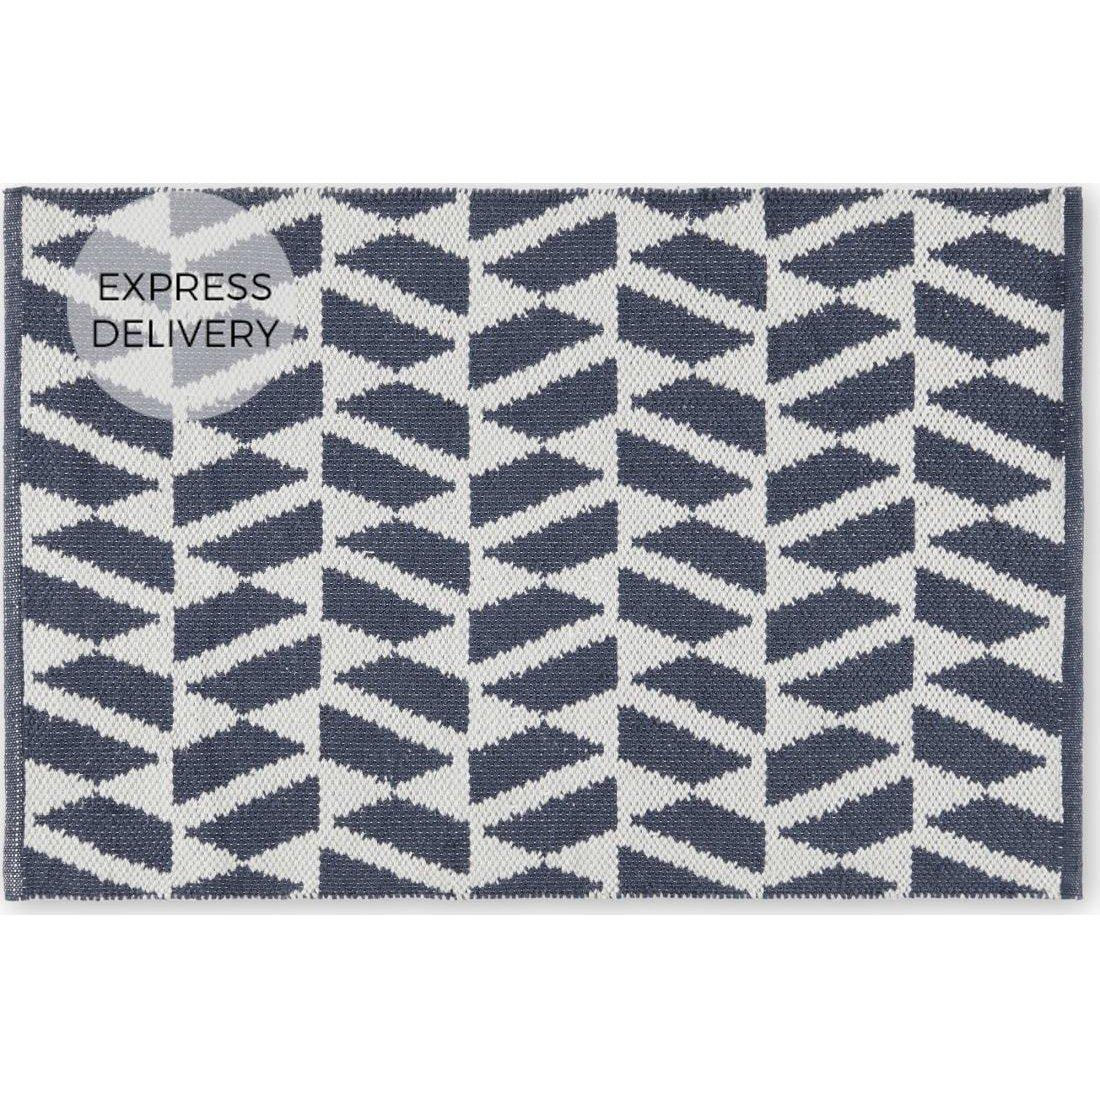 image-Oblique Indoor/ Outdoor Woven Rug, 60x90cm, Teal Blue & Grey